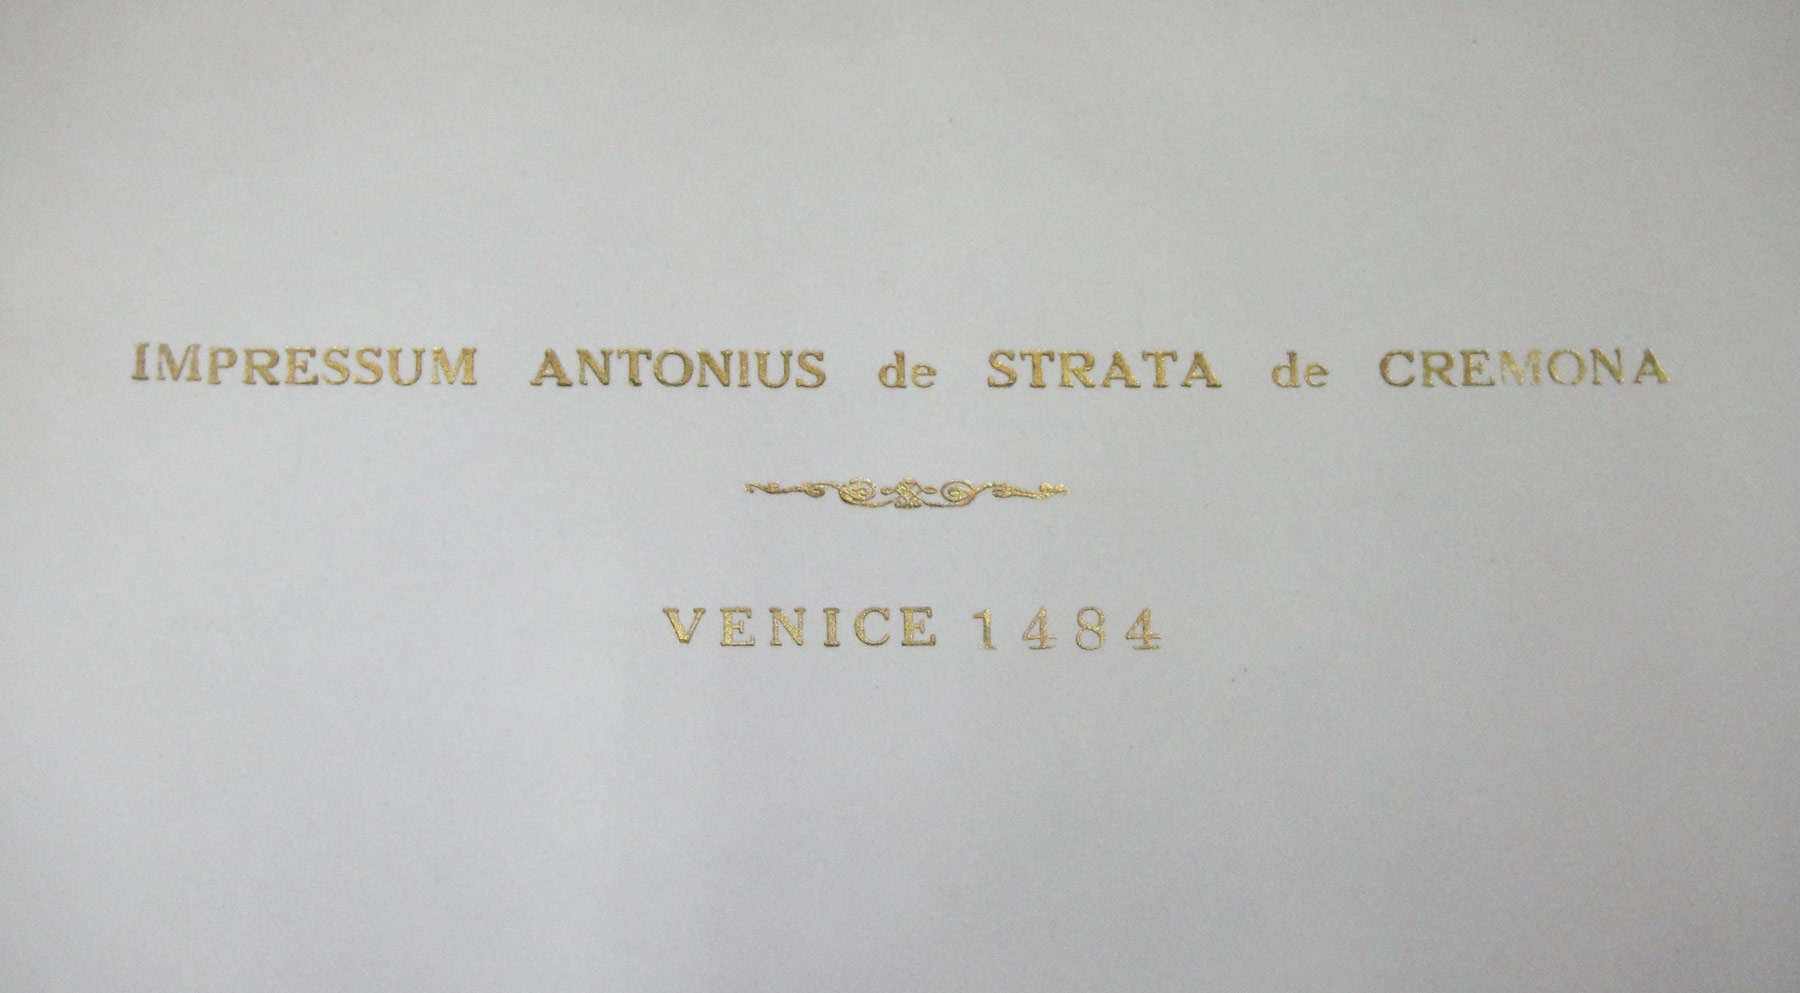 INCUNABULUM SUMMA THEOLOGIAE THEOLOGICA PARS PRIMA THOMAS AQUINAS 1484